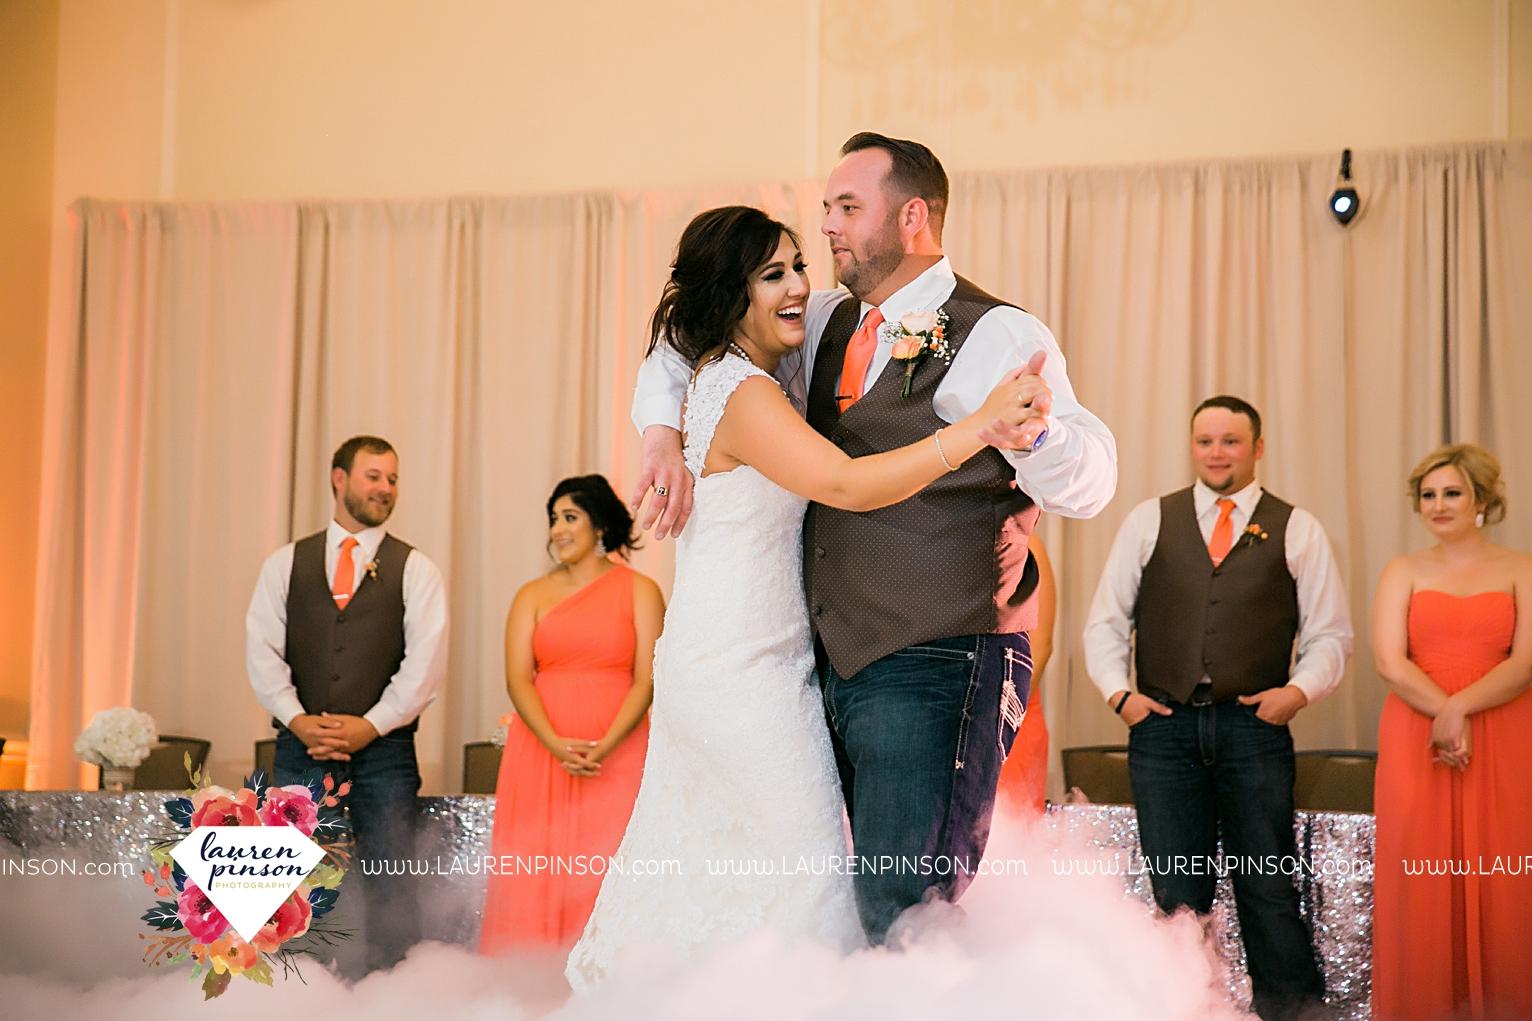 wichita-falls-texas-wedding-photographer-wellington-on-the-lake-with-mayfield-events_2986.jpg